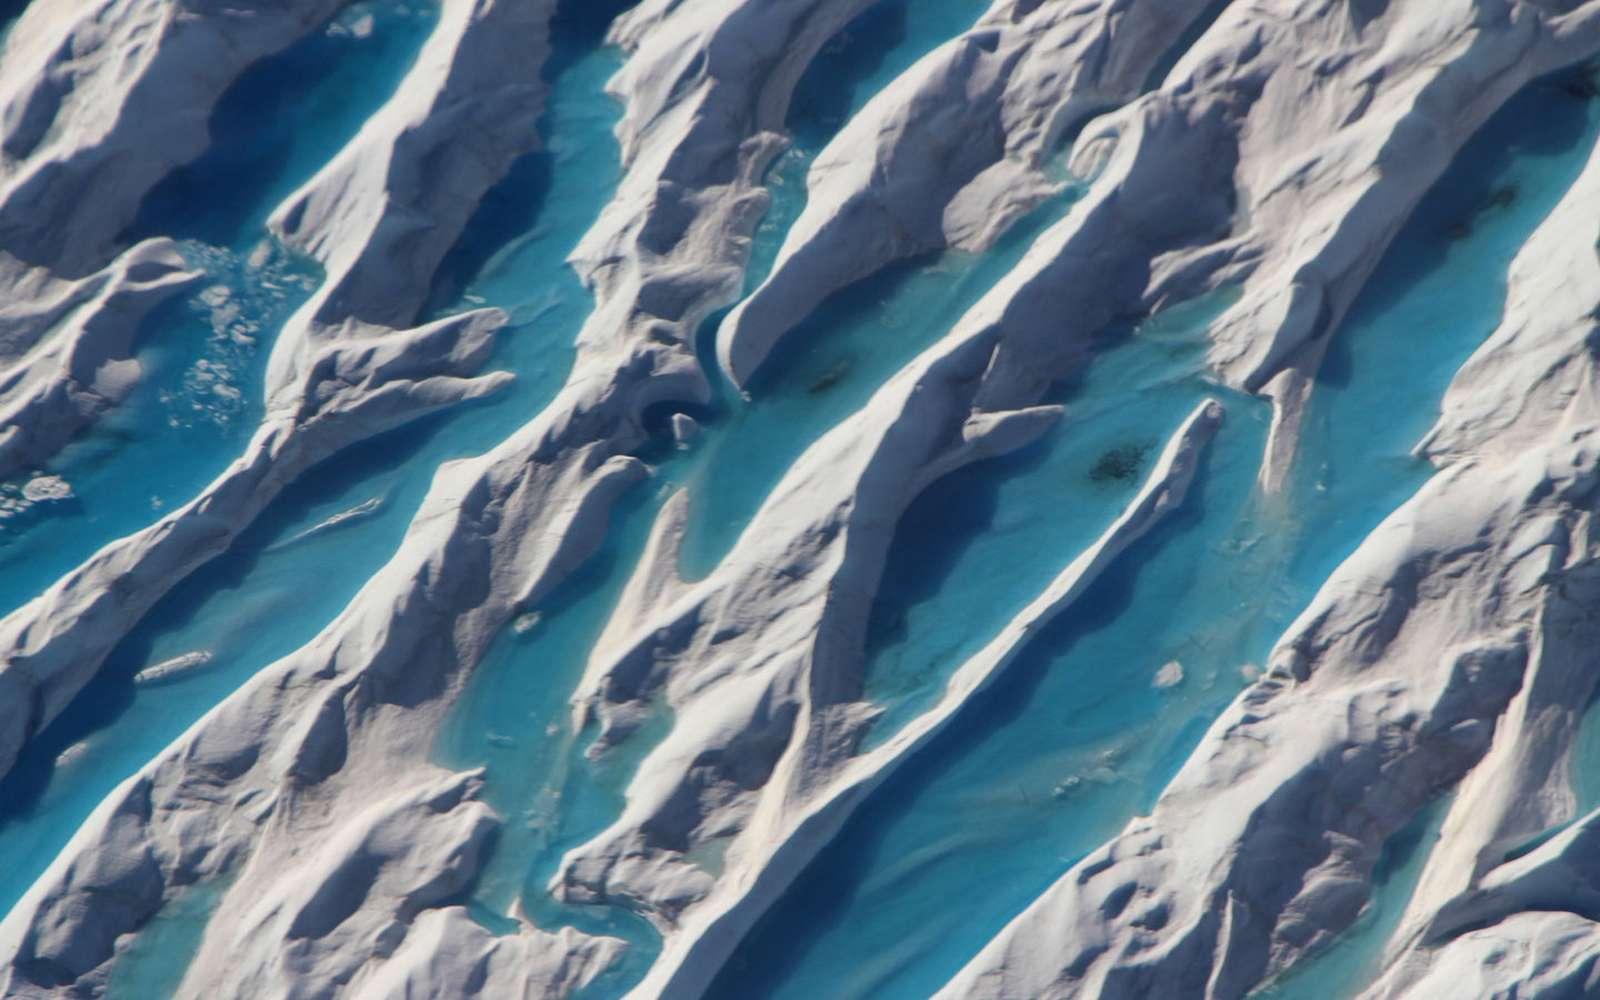 Des crevasses visibles au sud du Groenland en 2017. © Nasa, Operation IceBridge